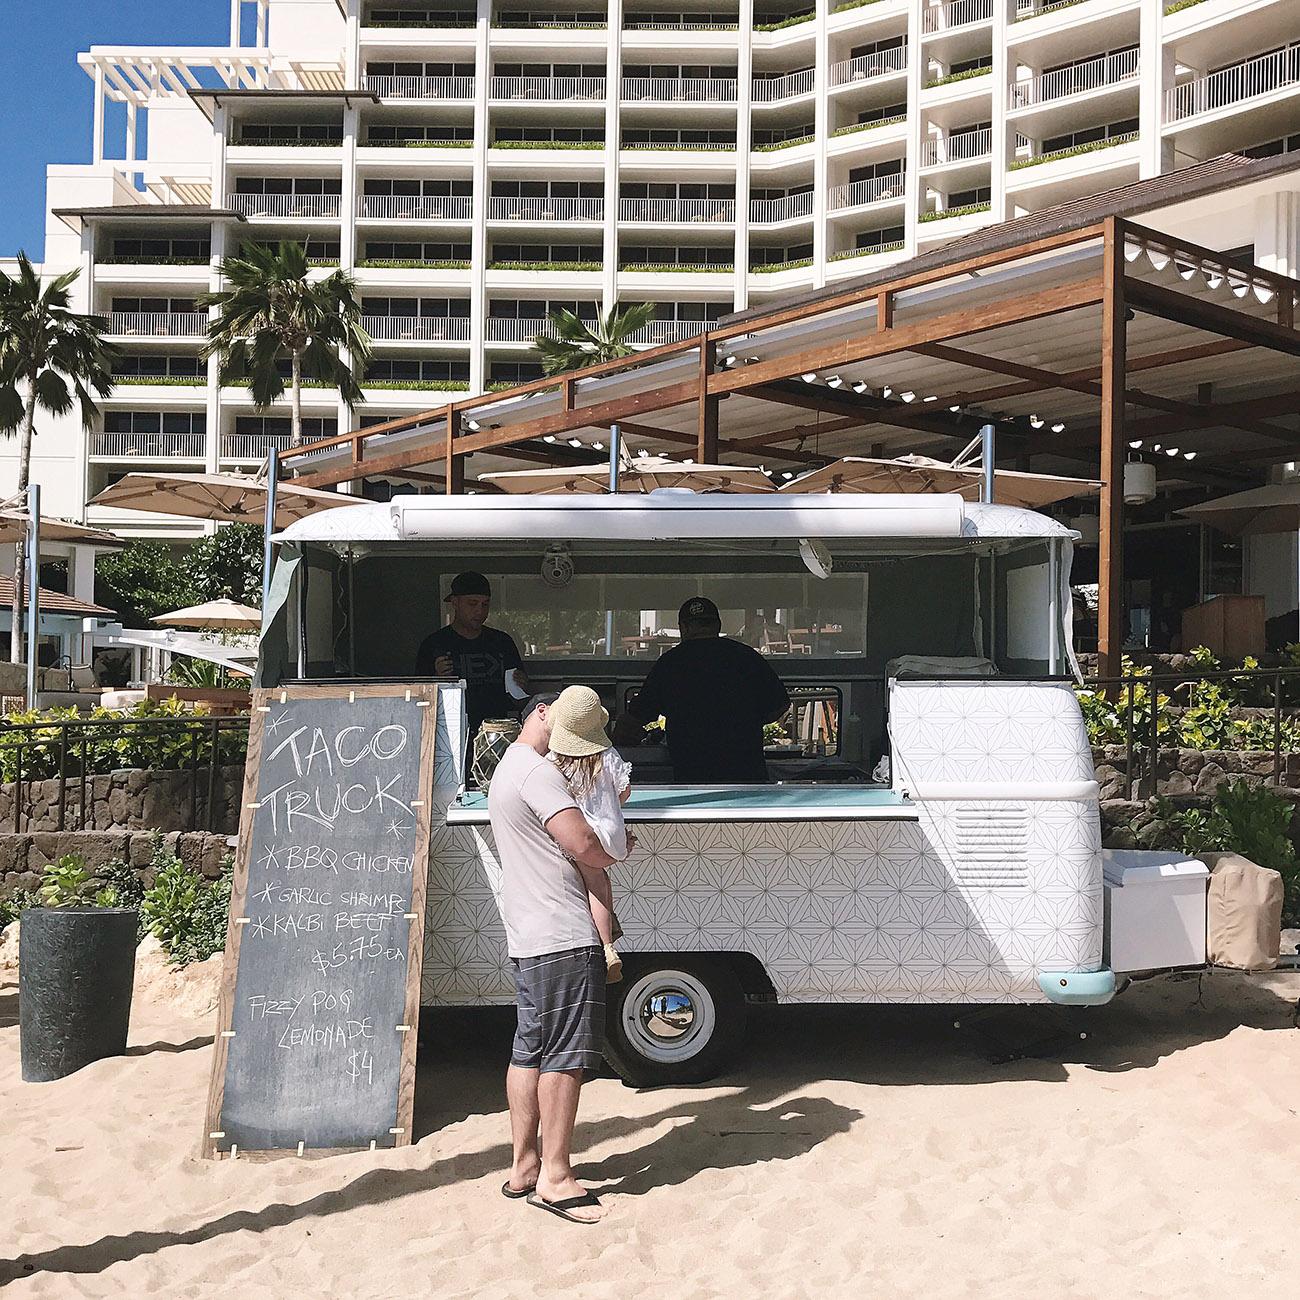 FS Oahu taco truck